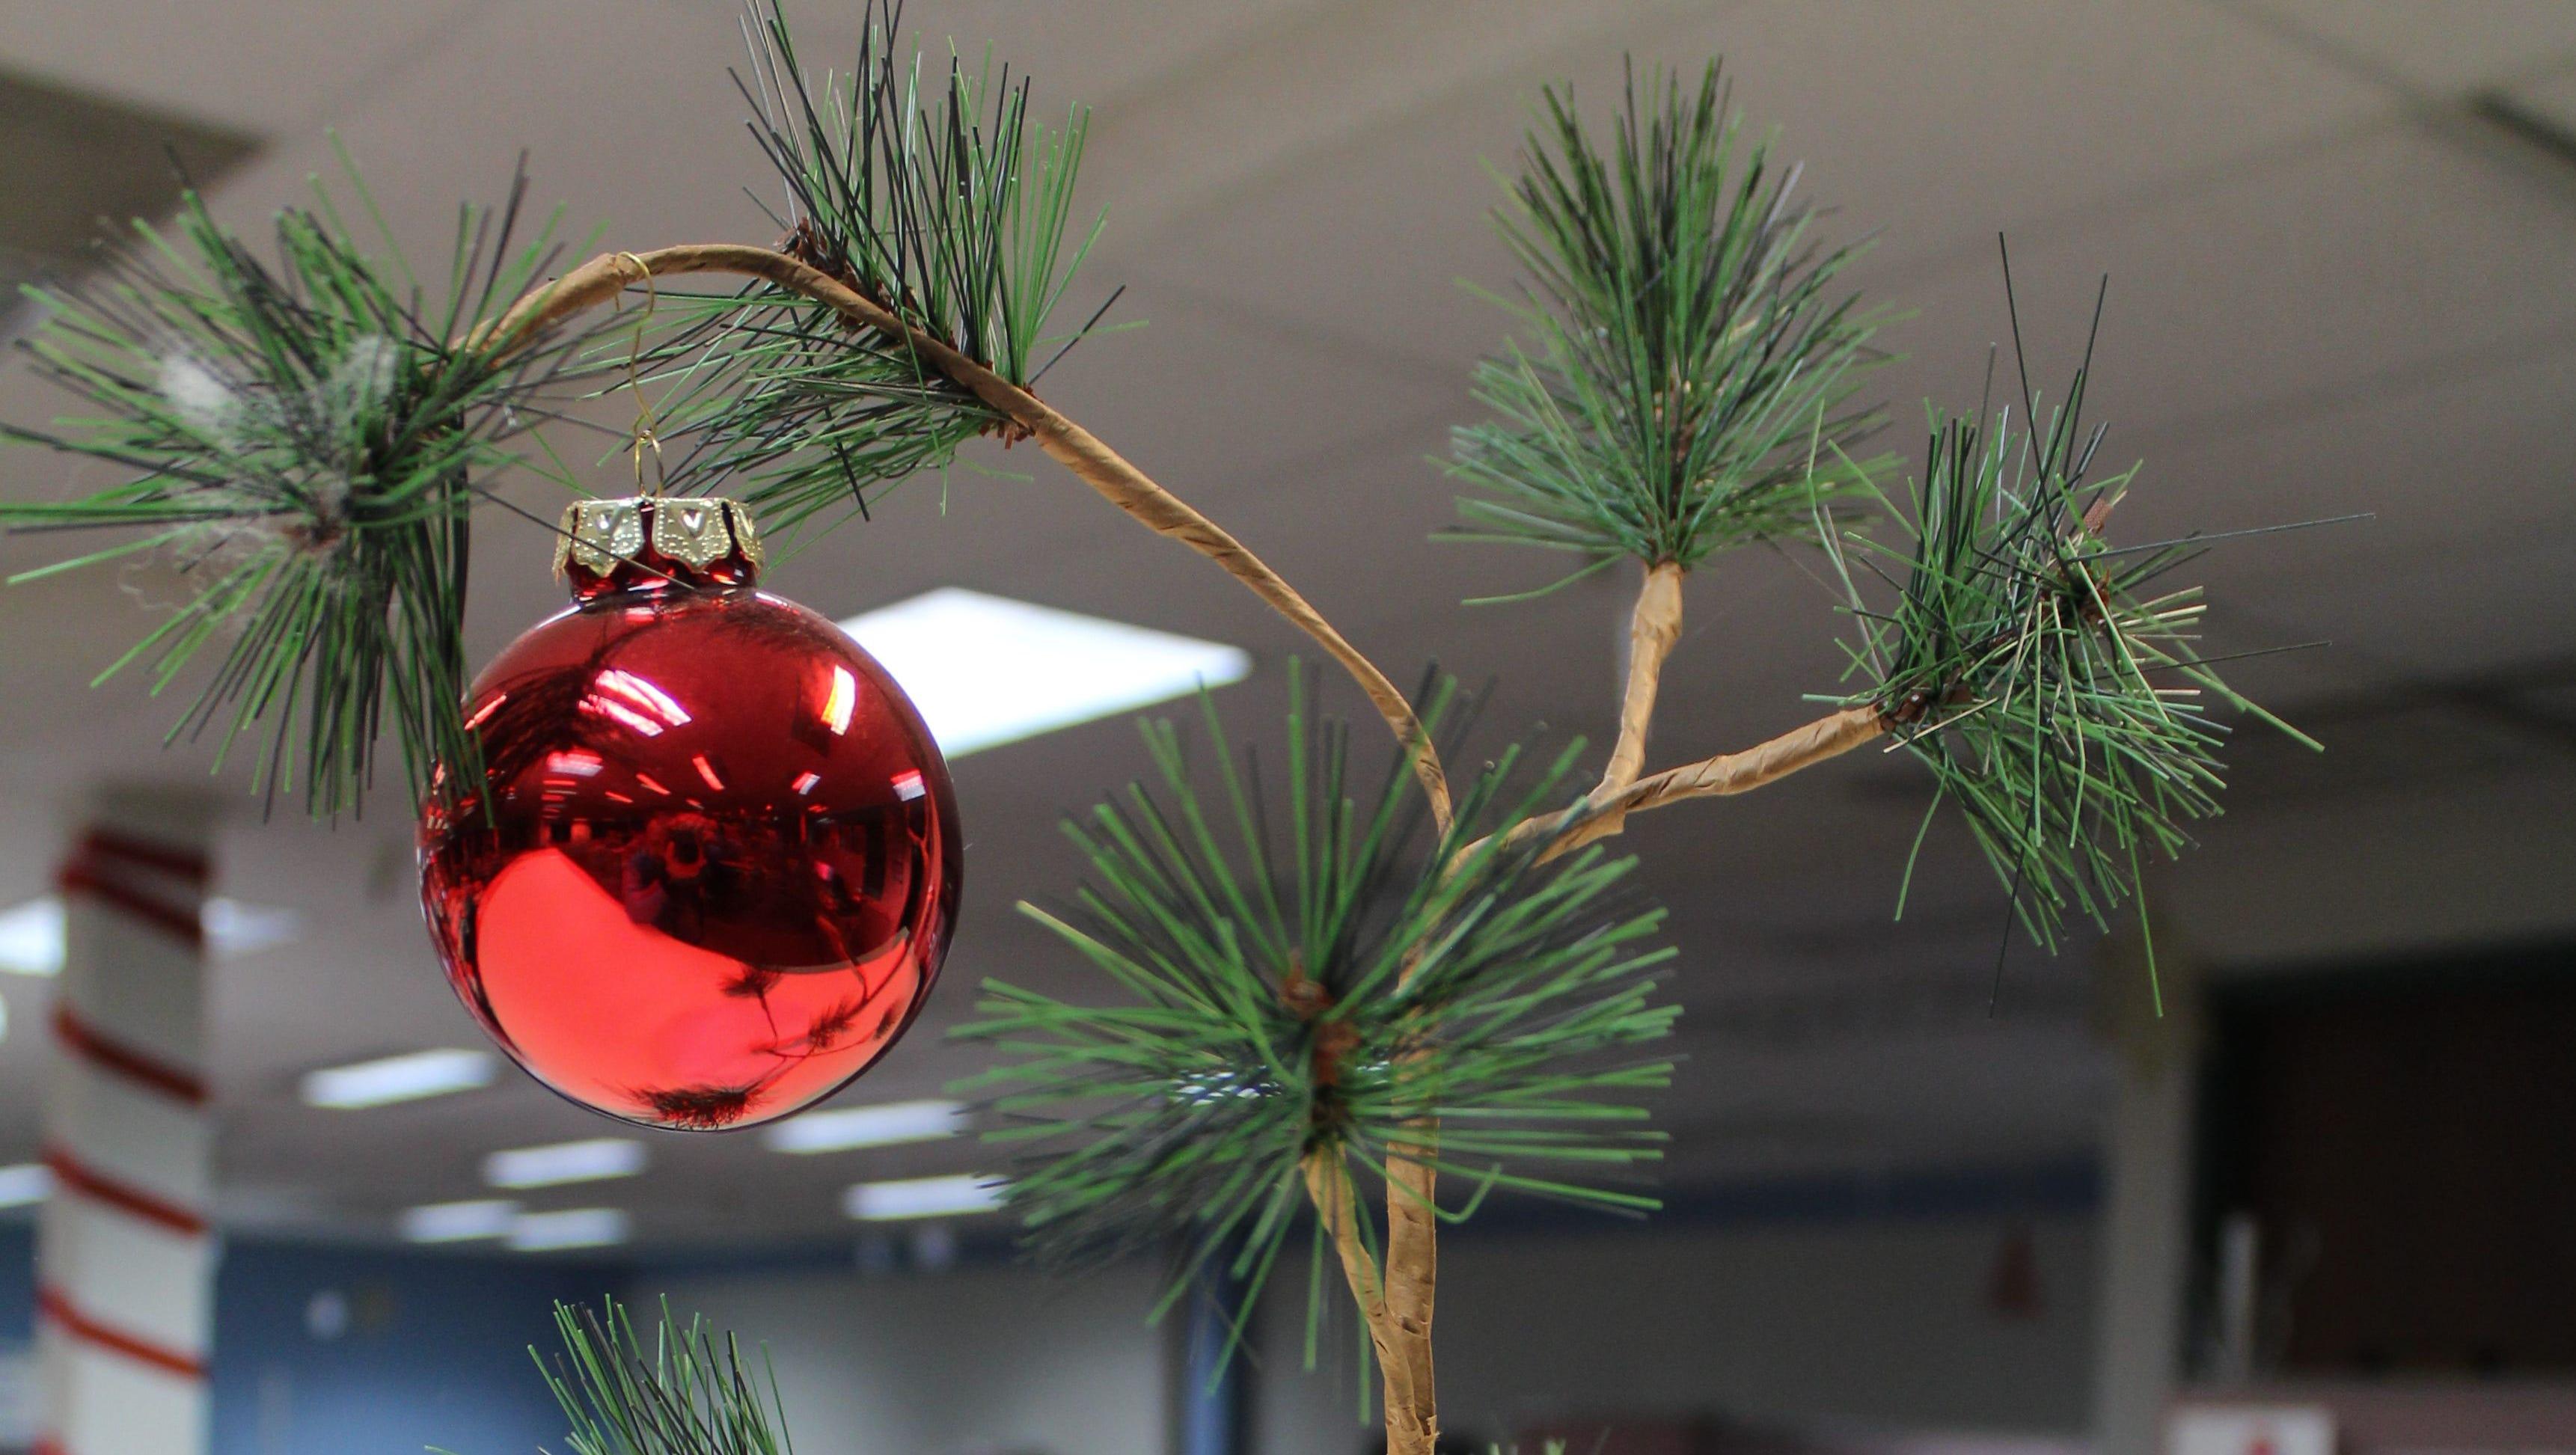 Decorating Vintage Aluminum Christmas Tree  from www.gannett-cdn.com